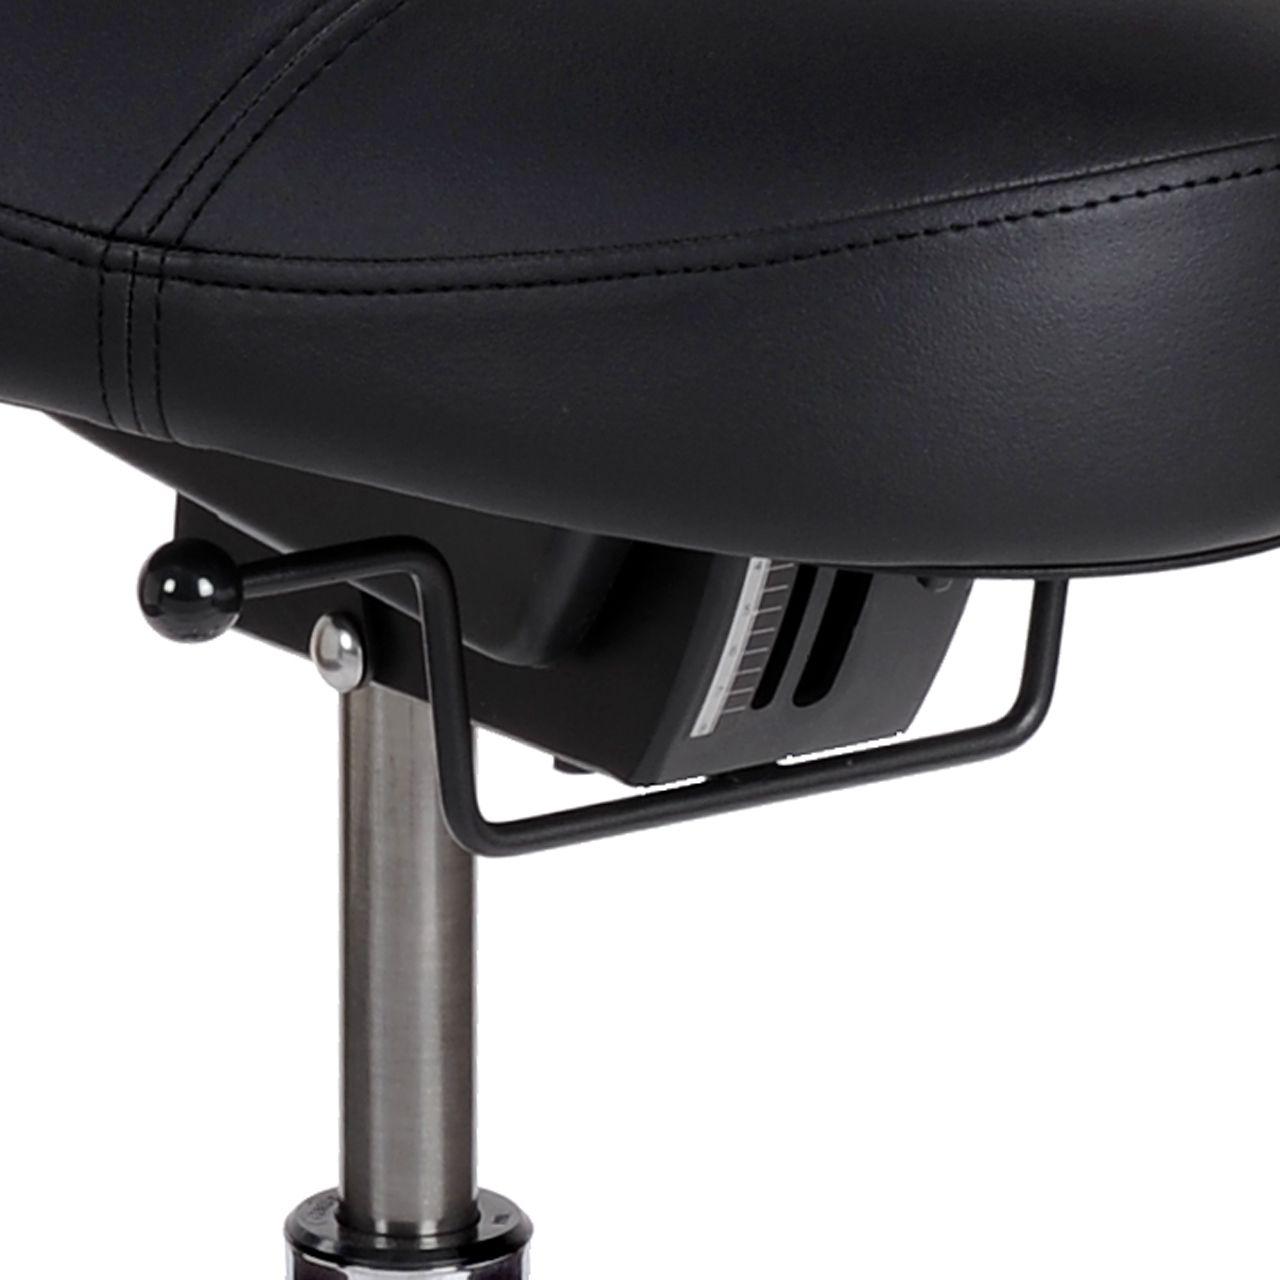 Dynamic-stoel-zit-stahupstkandyn01_0019s_0002_detail